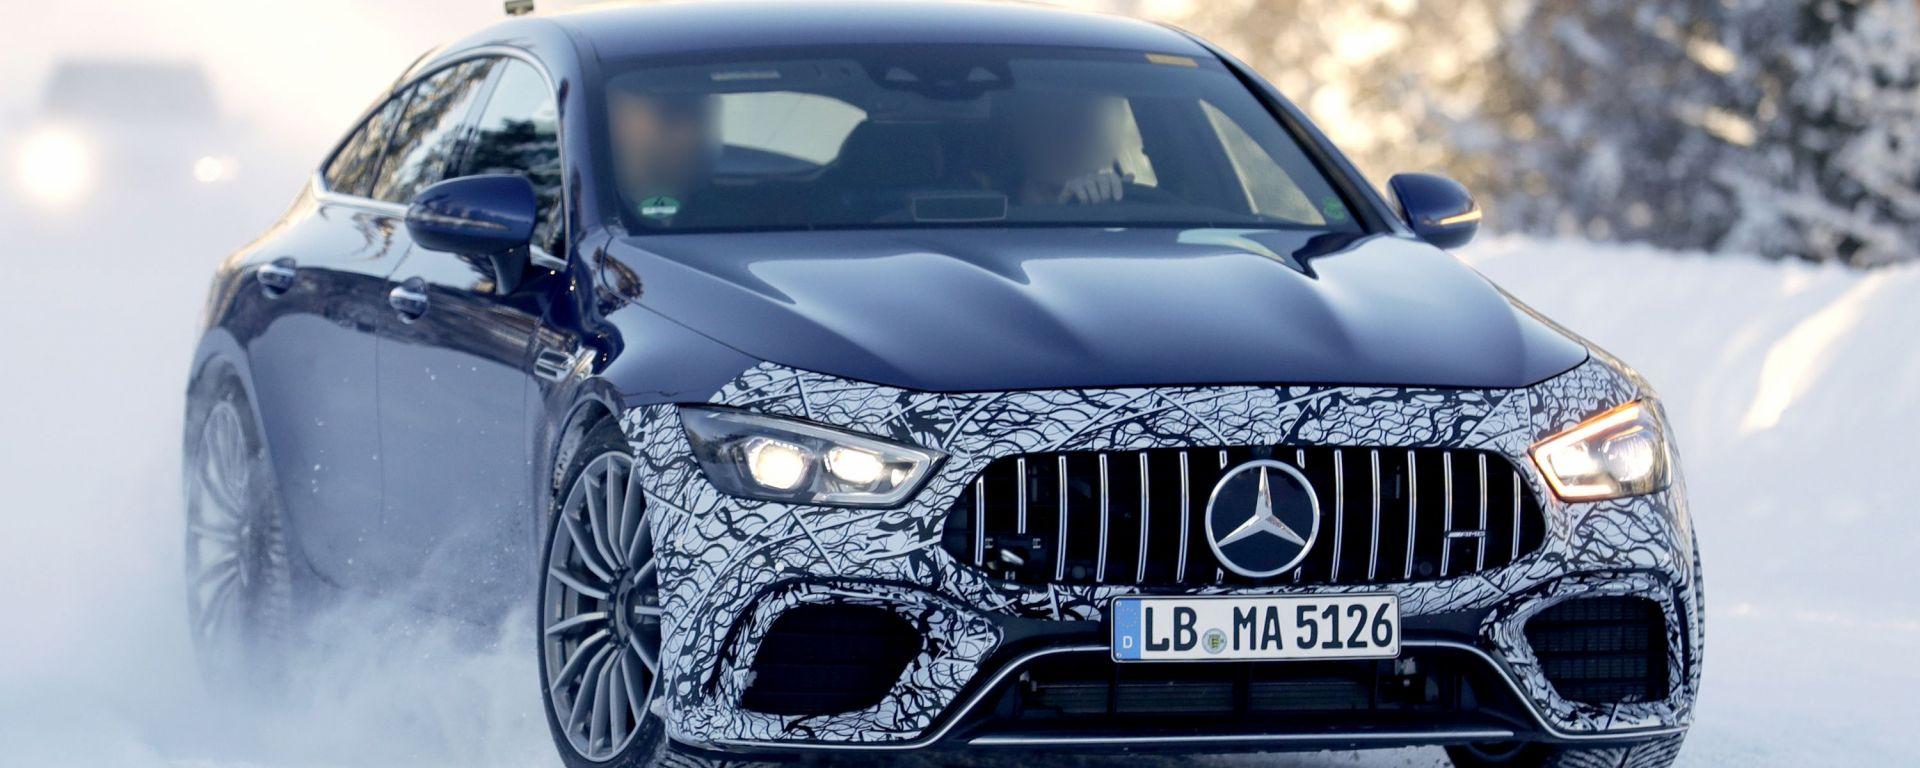 Mercedes-AMG GT 73 EQ Power+ 4 Coupé: visuale di 3/4 anteriore